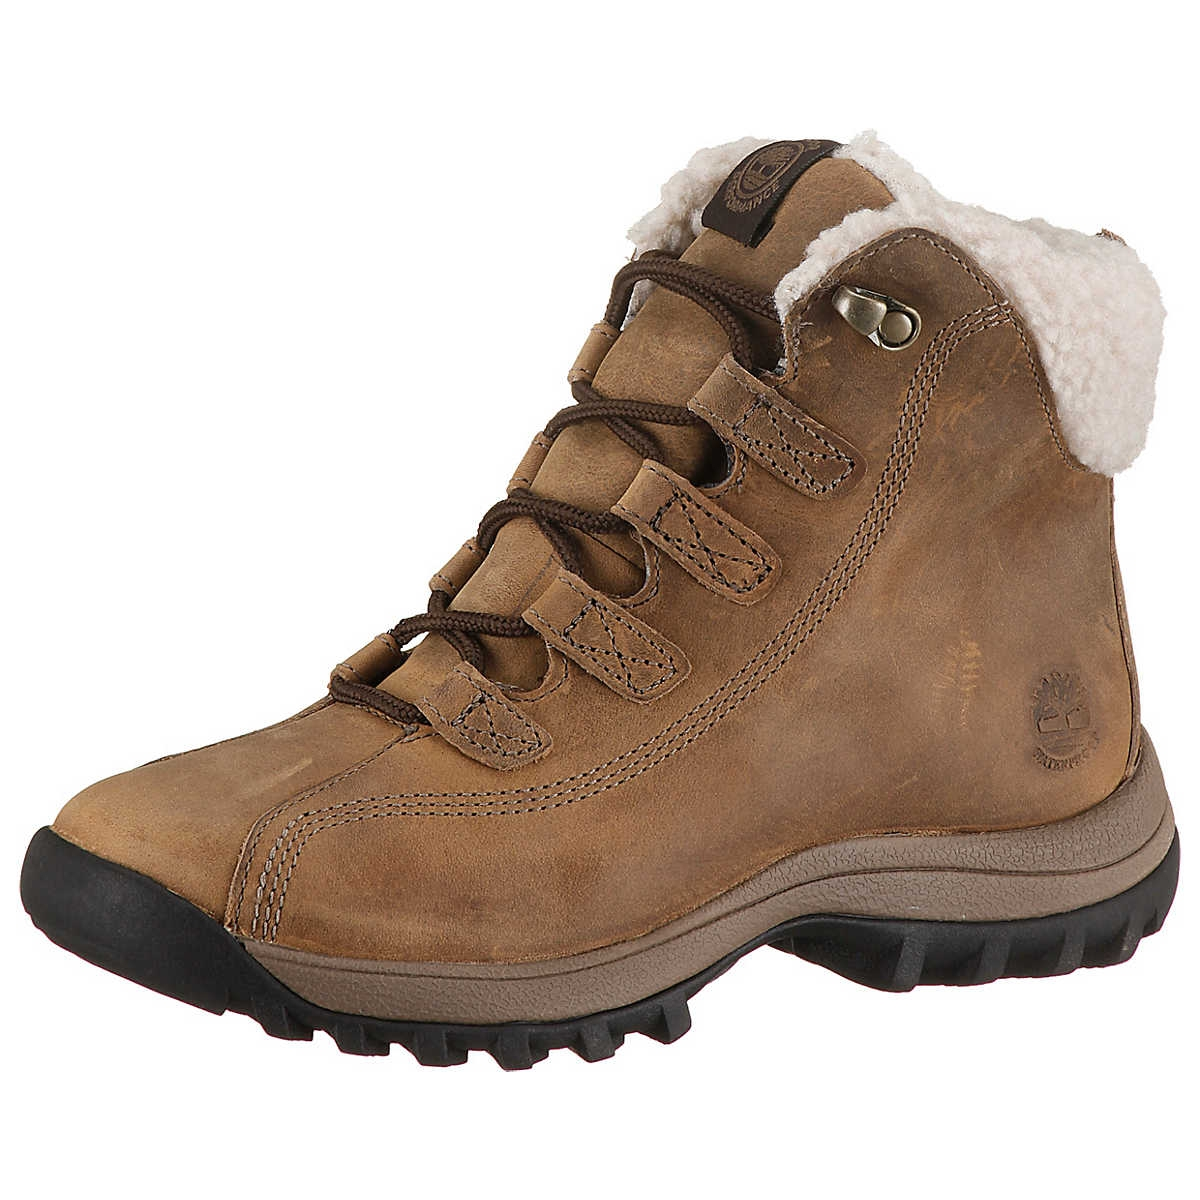 Image of Timberland Canard Resort Mid 2.0 WP Walking Boot (Women s) - Brown 341941d0aa9c